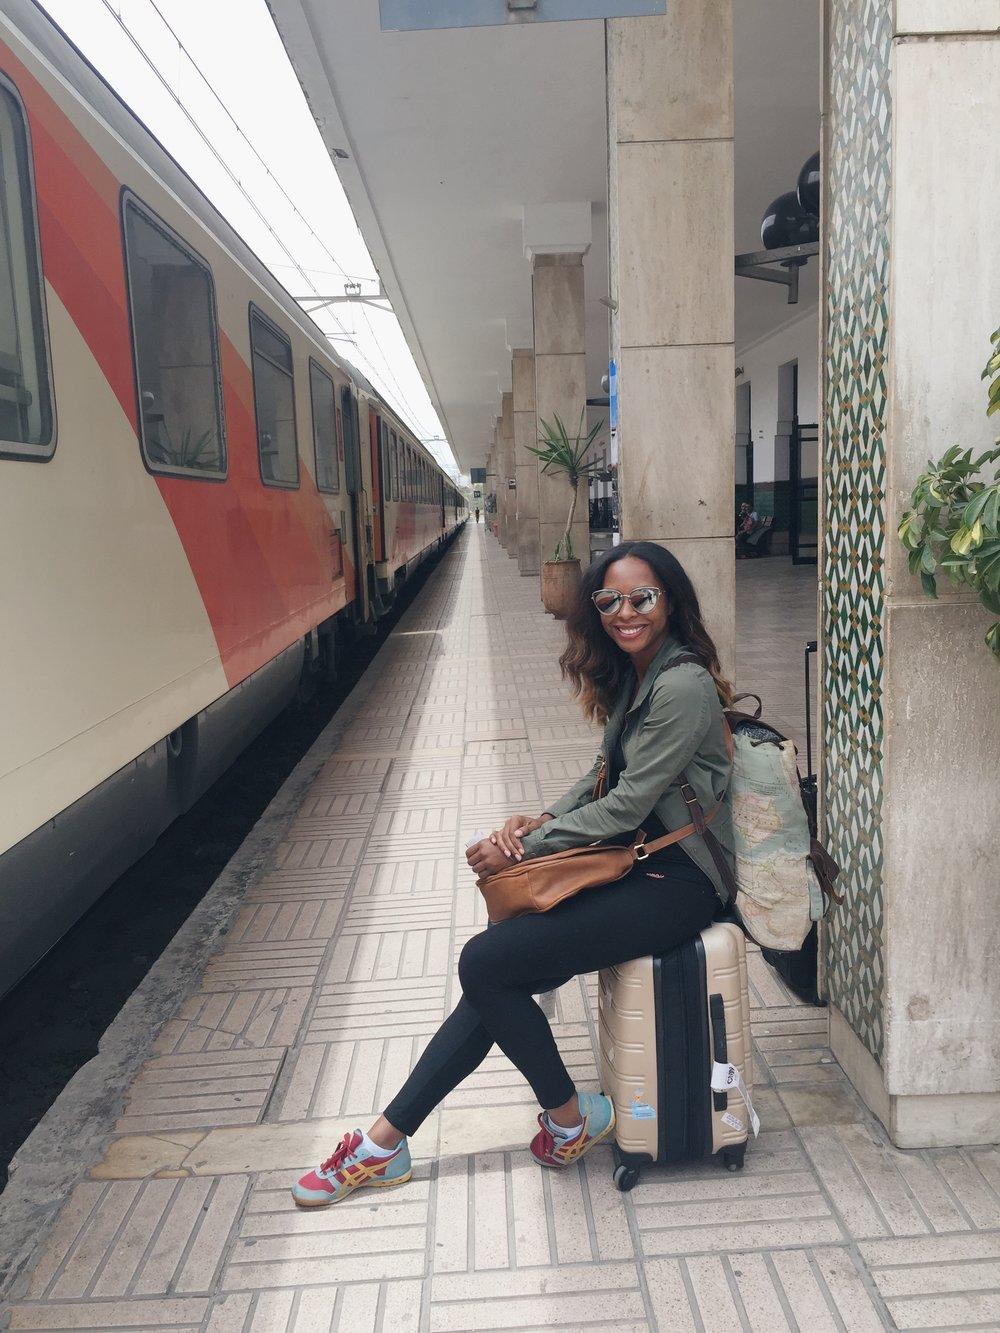 Train Station in Casablanca